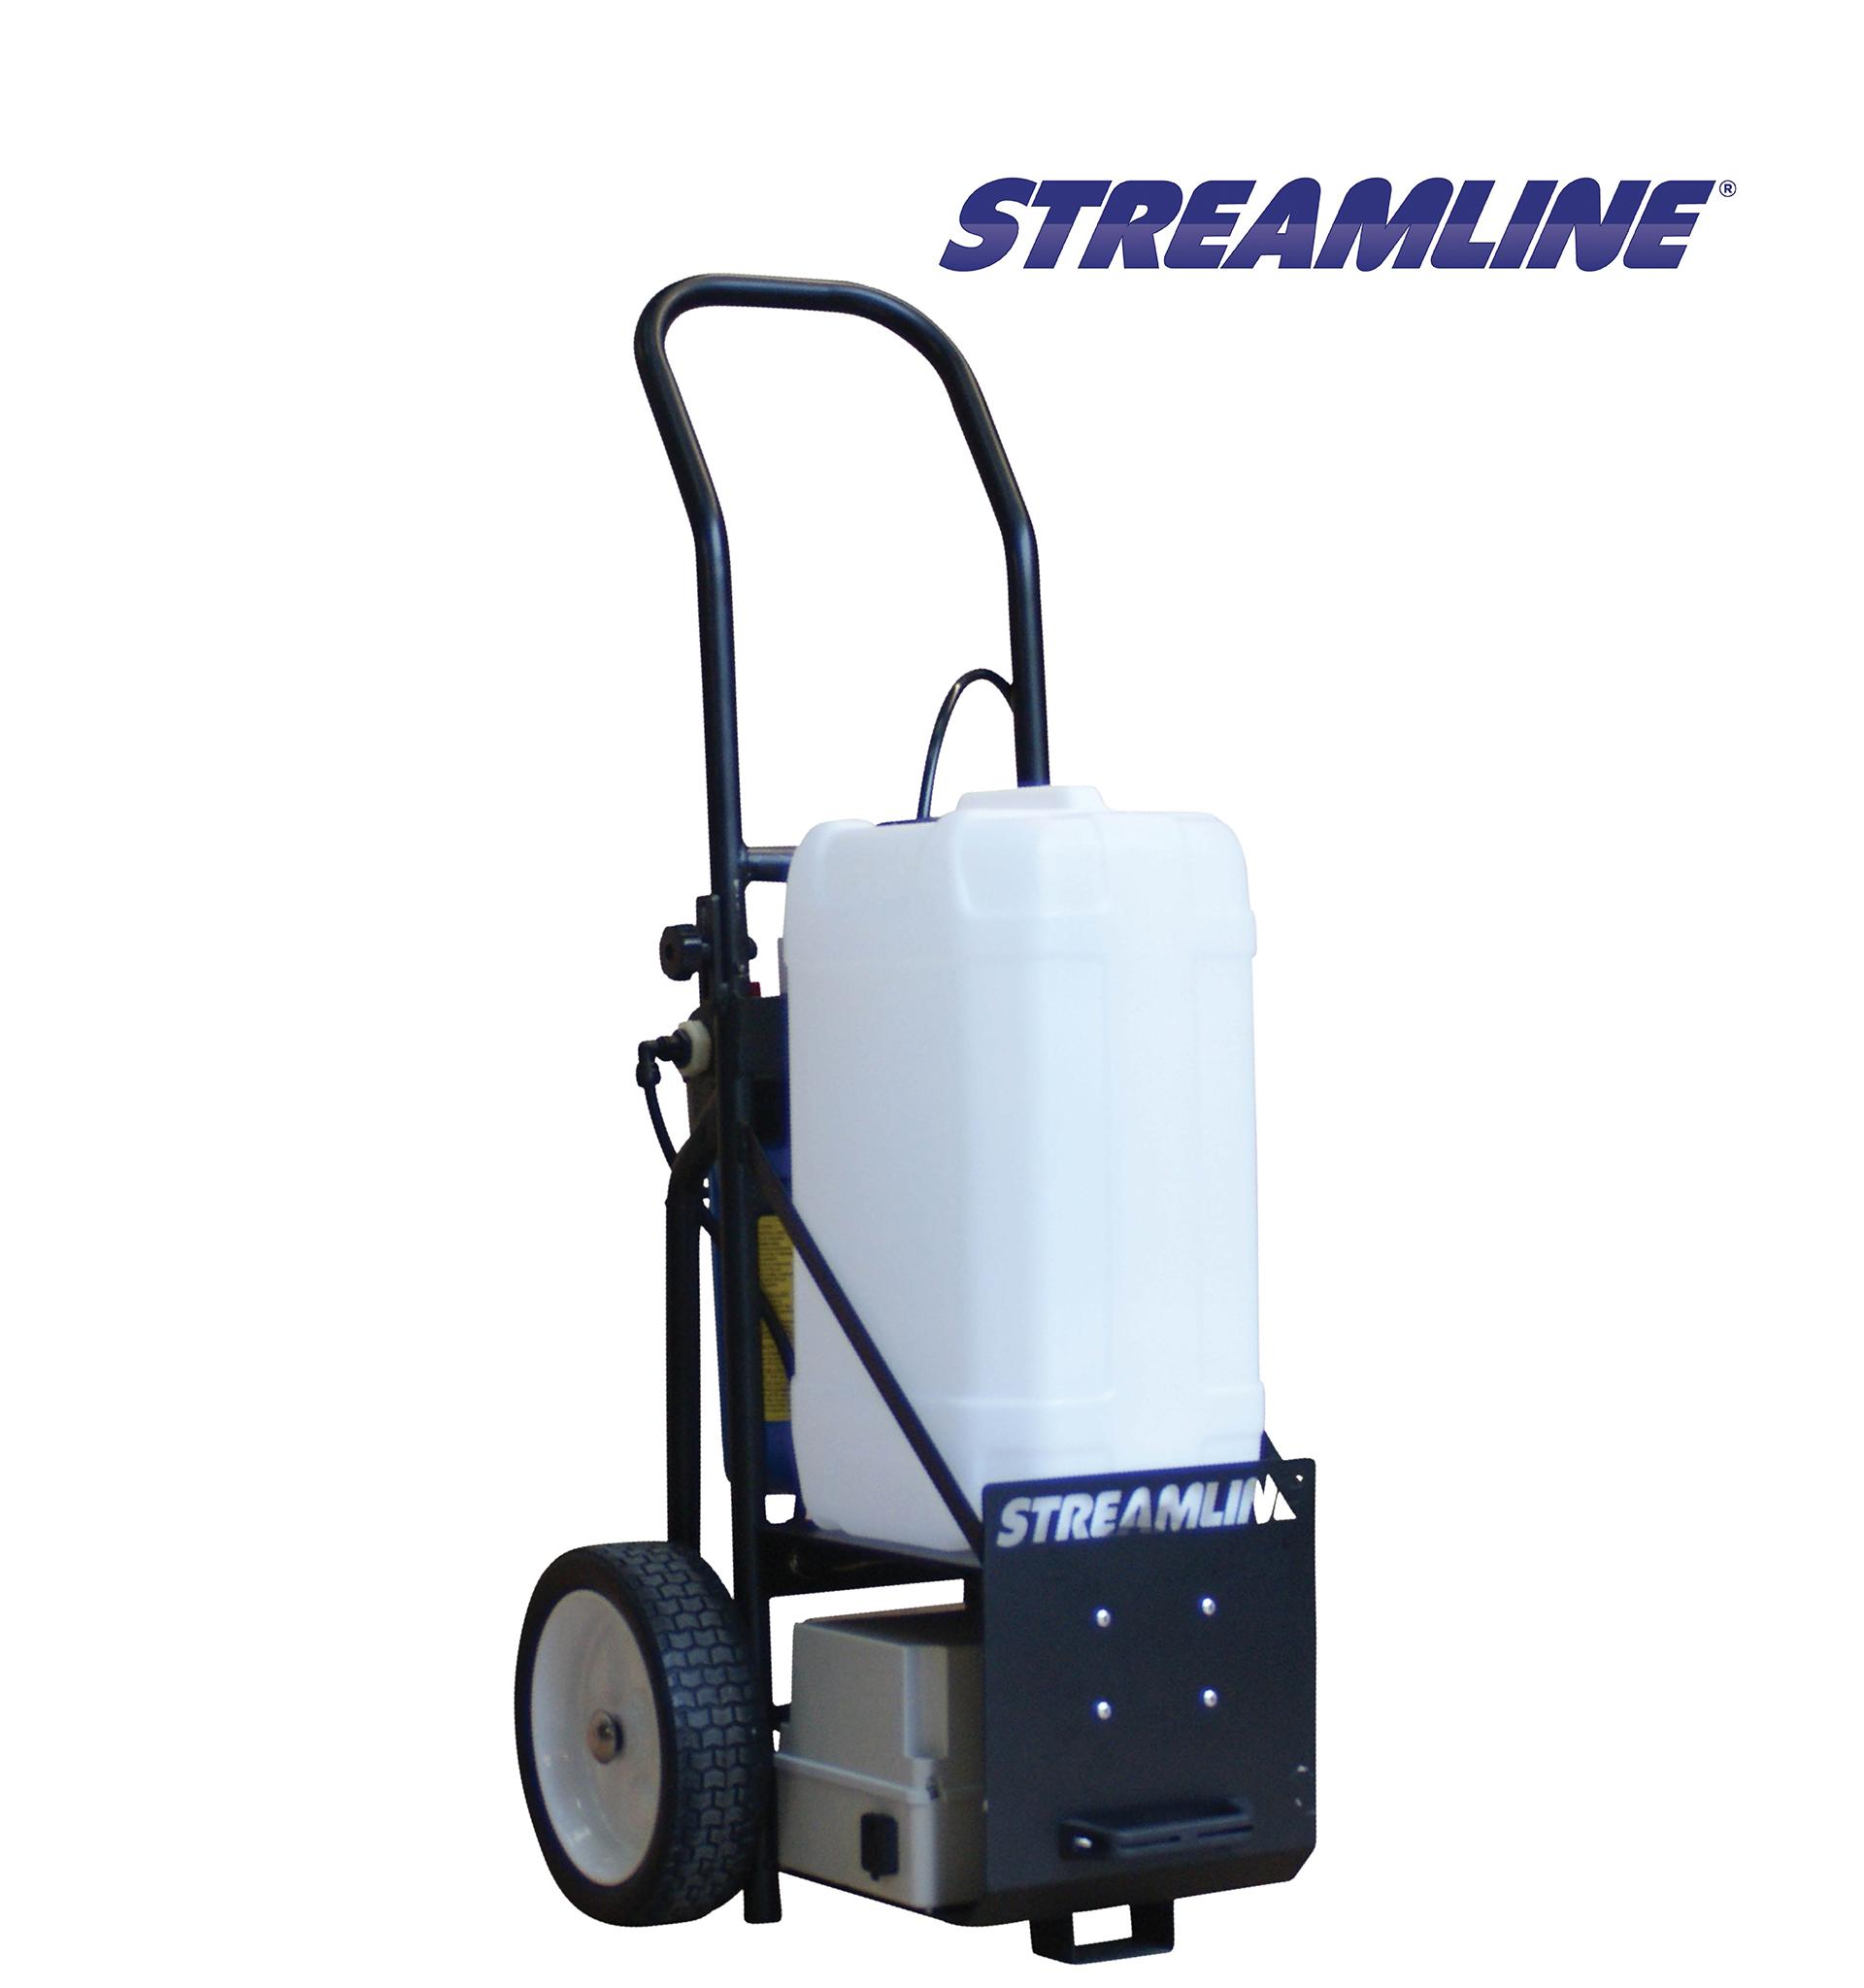 Streamline Wfp Filtration Mobile Trolley System For Window